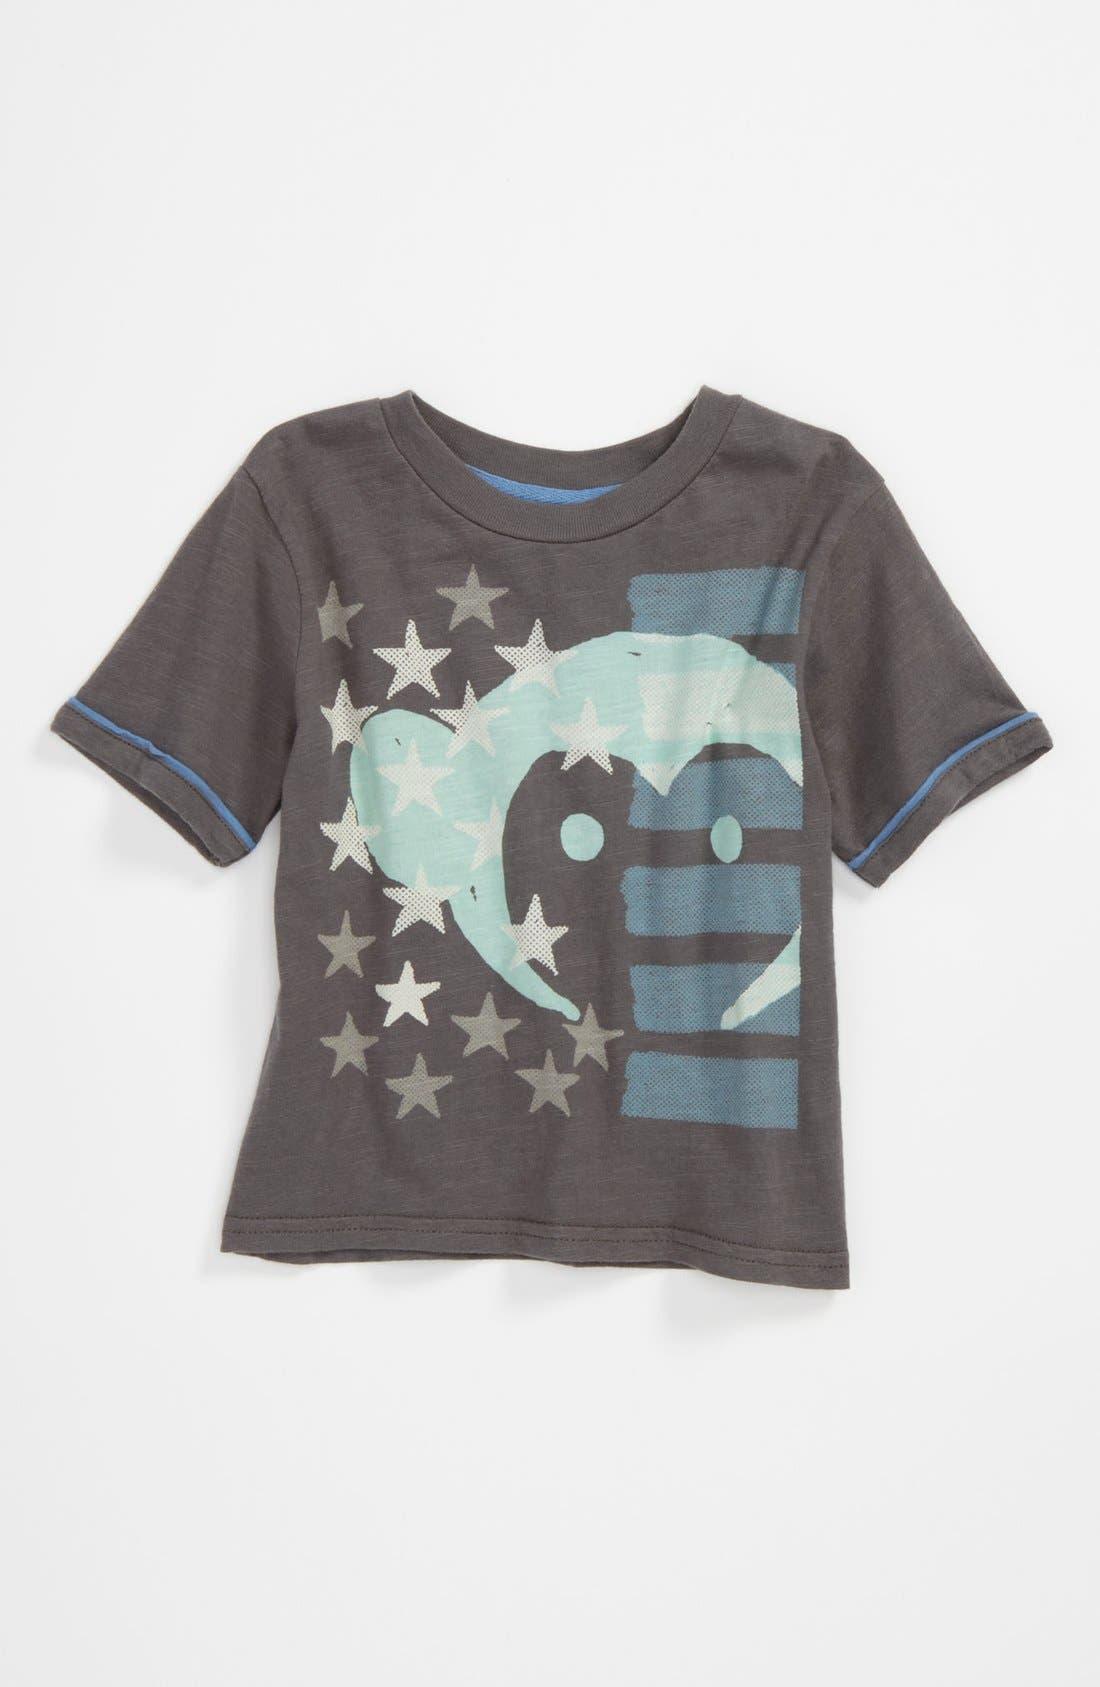 Alternate Image 1 Selected - Appaman 'American Monkey' T-Shirt (Toddler)